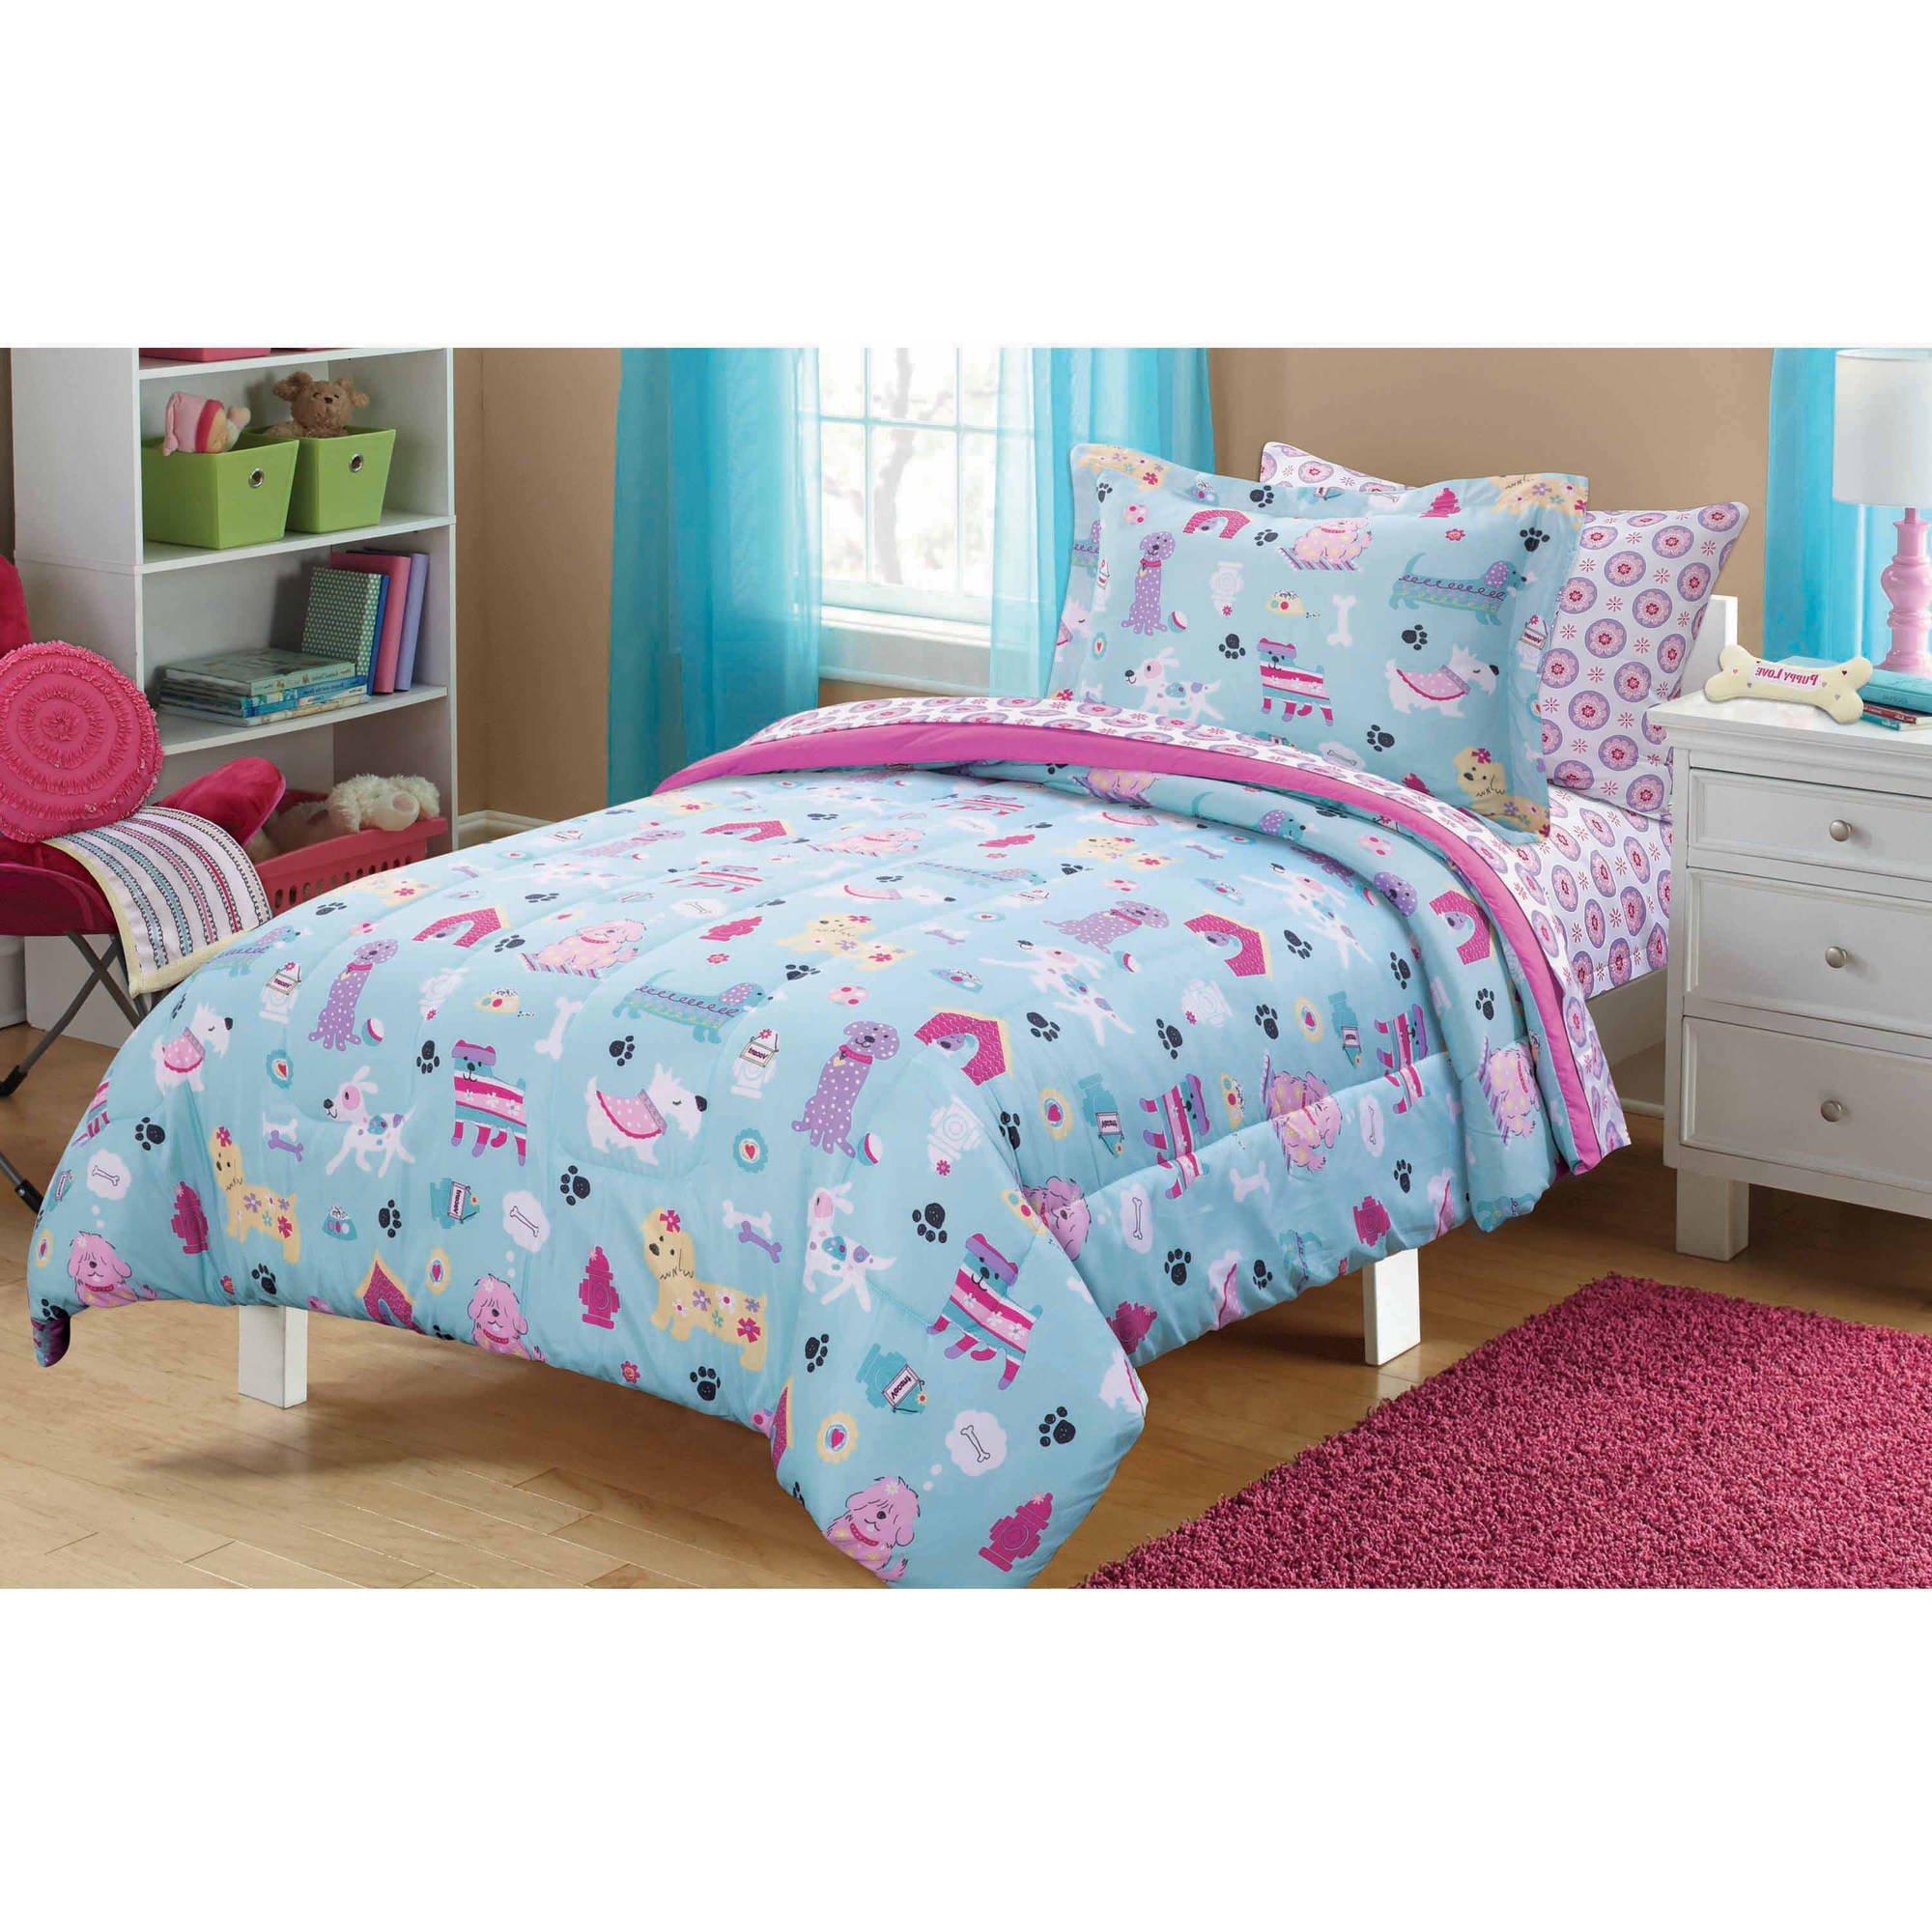 5 Piece Girls Light Blue Purple Puppy Love Comforter Twin Set, Yellow Pink Dachshund Bulldog Pomeranian Doggy Paw Dog Dish House Bones Pattern, Cute Cuddly Kids Best Pal Animal Themed Teen, Polyester